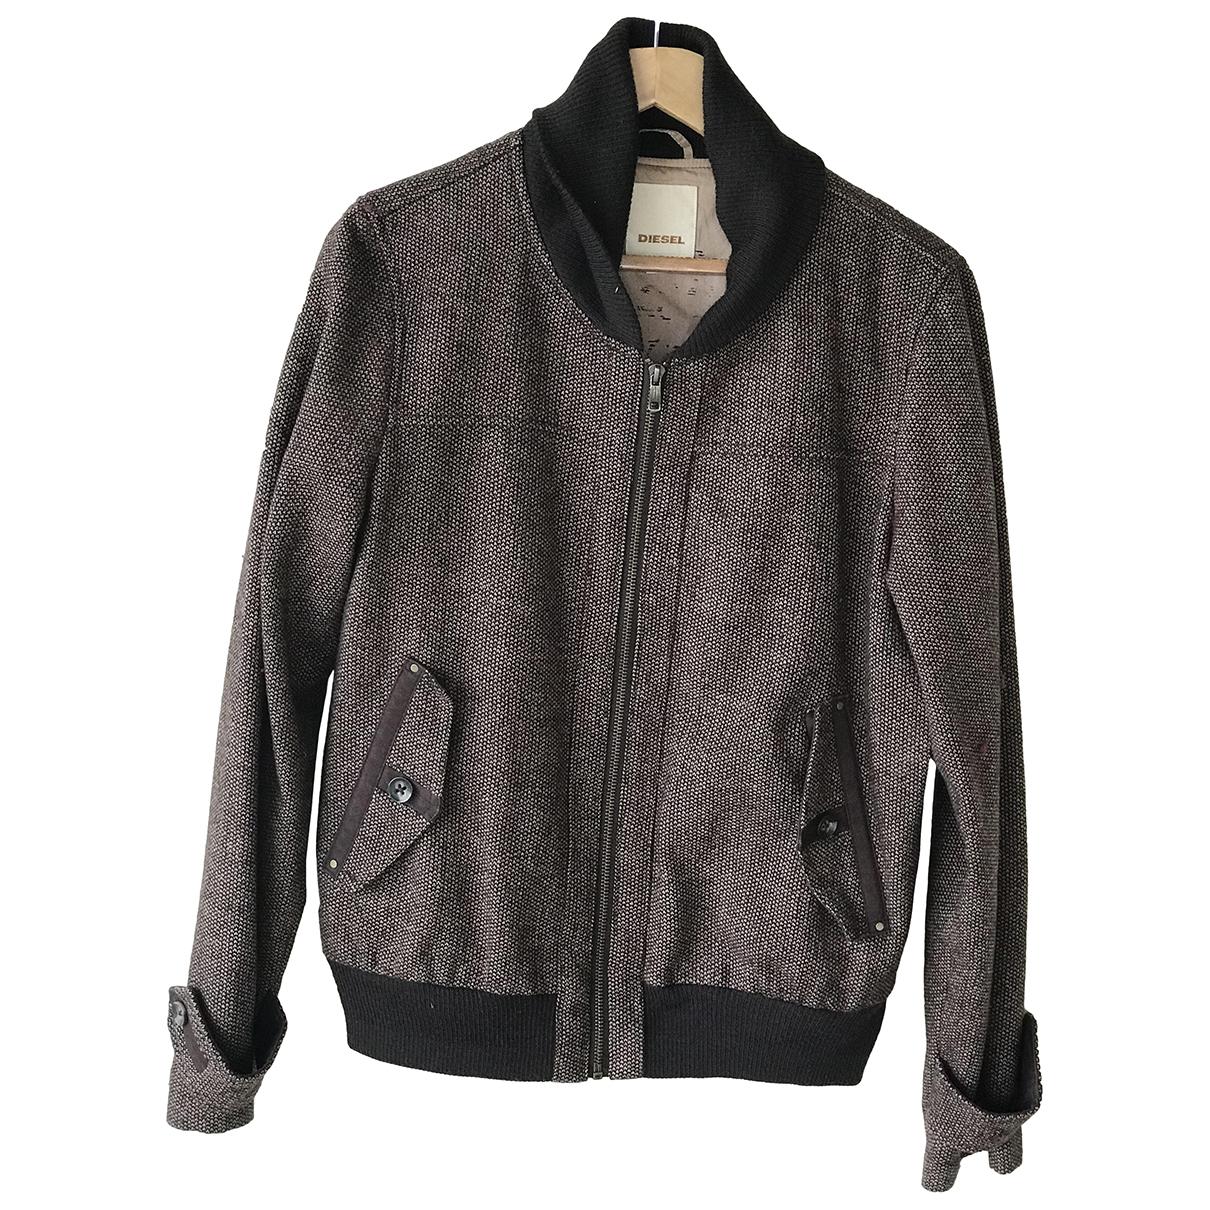 Diesel \N Brown Cotton jacket for Women M International